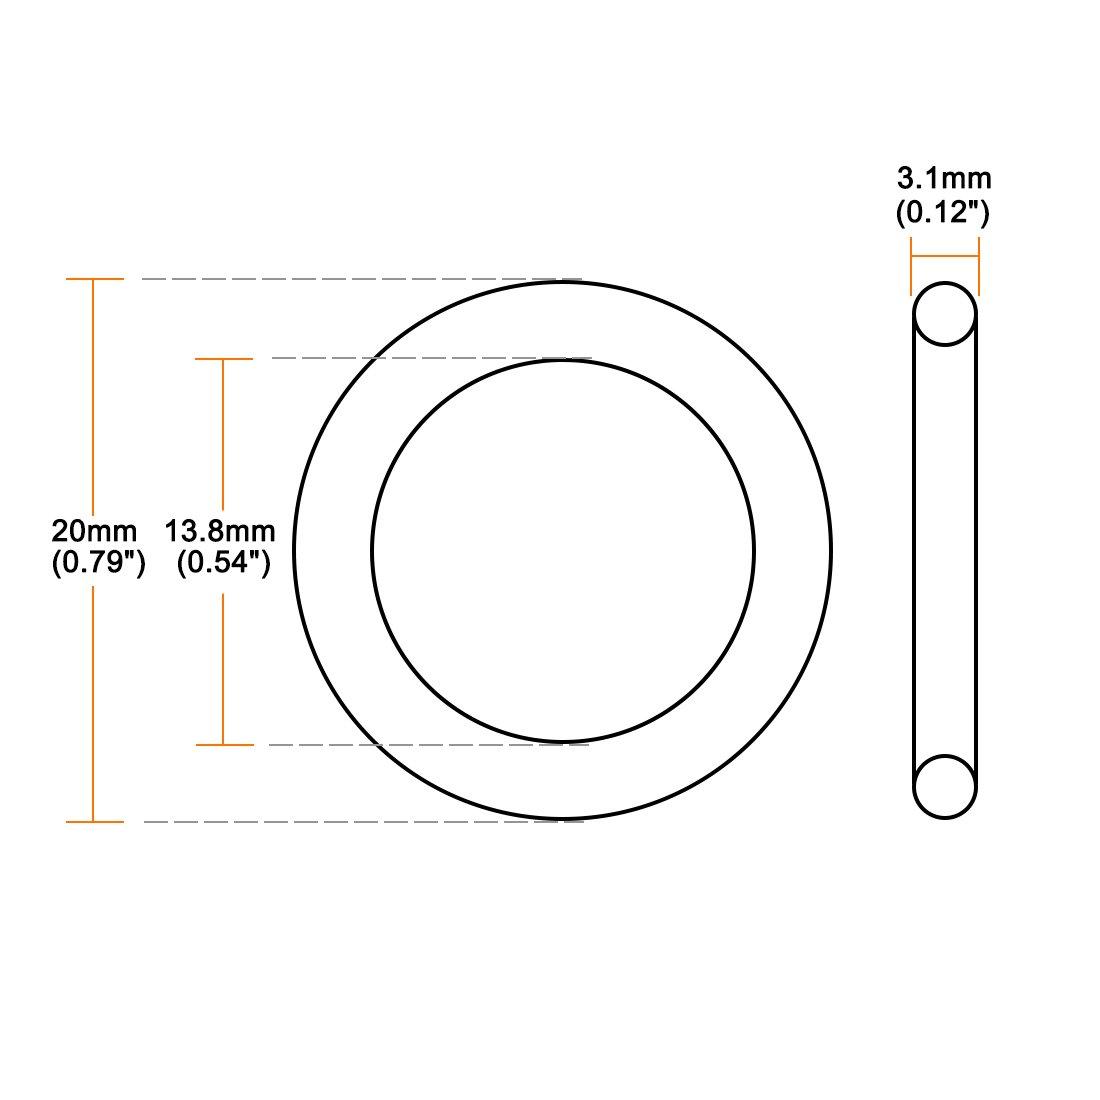 sourcing map O-Ringe Fluor Kautschuk 6,8mm x 13mm x 3,1mm Dichtungsringe Dichtung Gr/ün